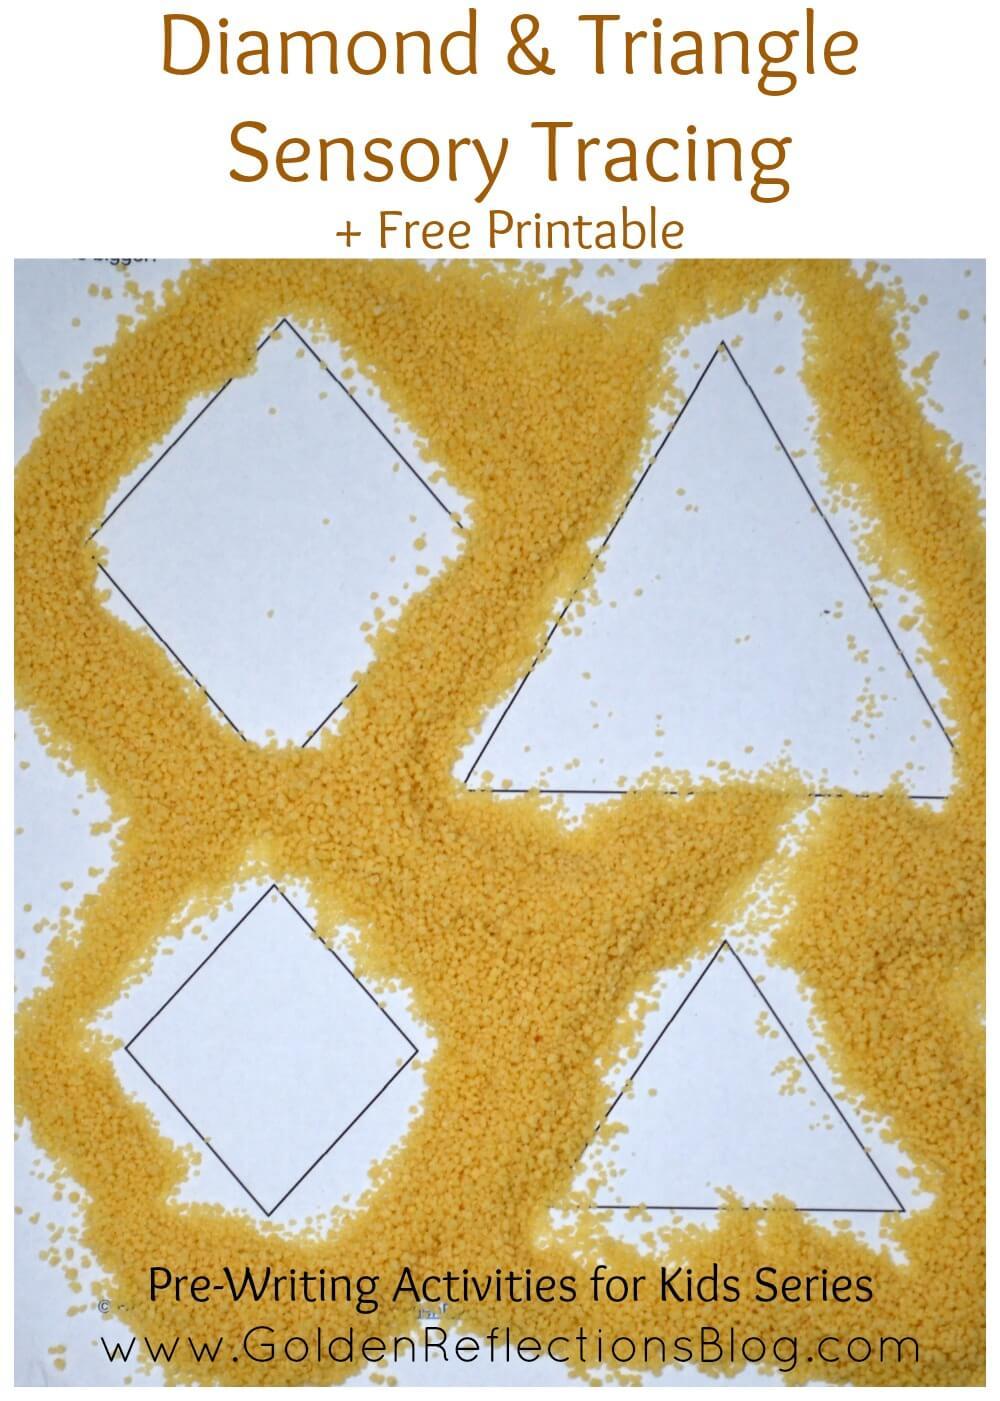 Diamond & Triangle Sensory Tracing : Pre-Writing Activities for Kids Series | www.GoldenReflectionsBlog.com